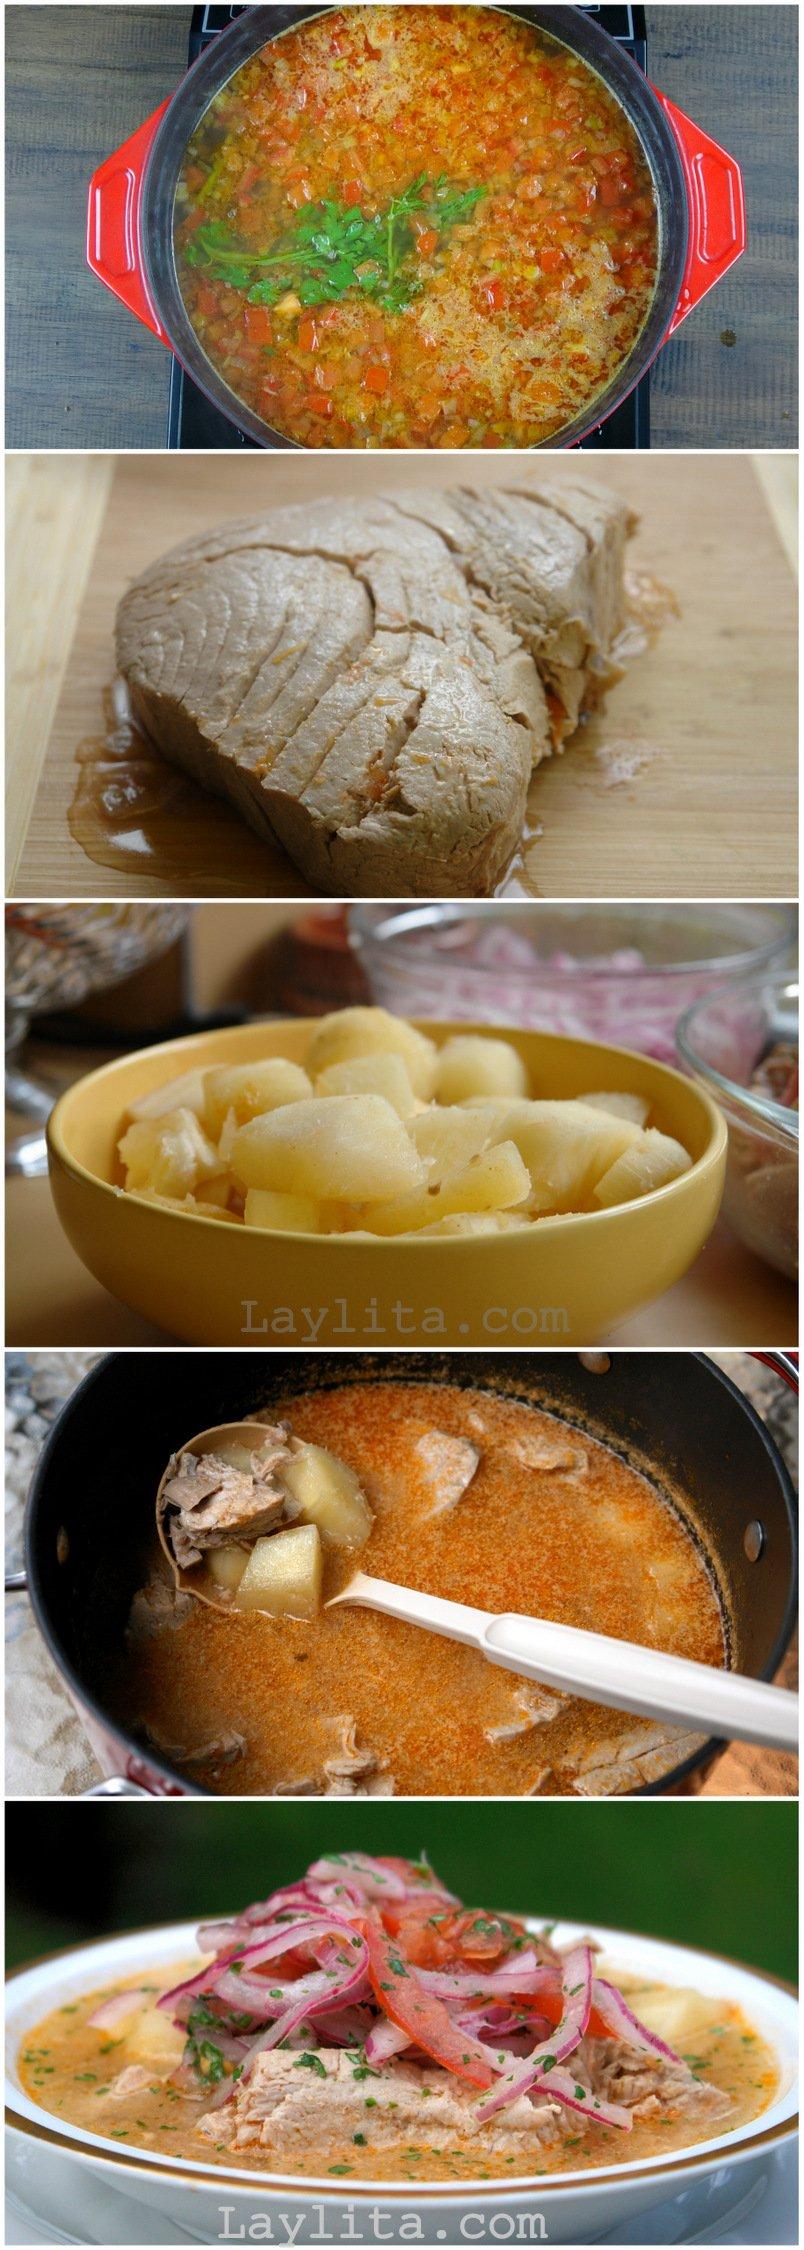 Préparation de la soupe de thon encebollado